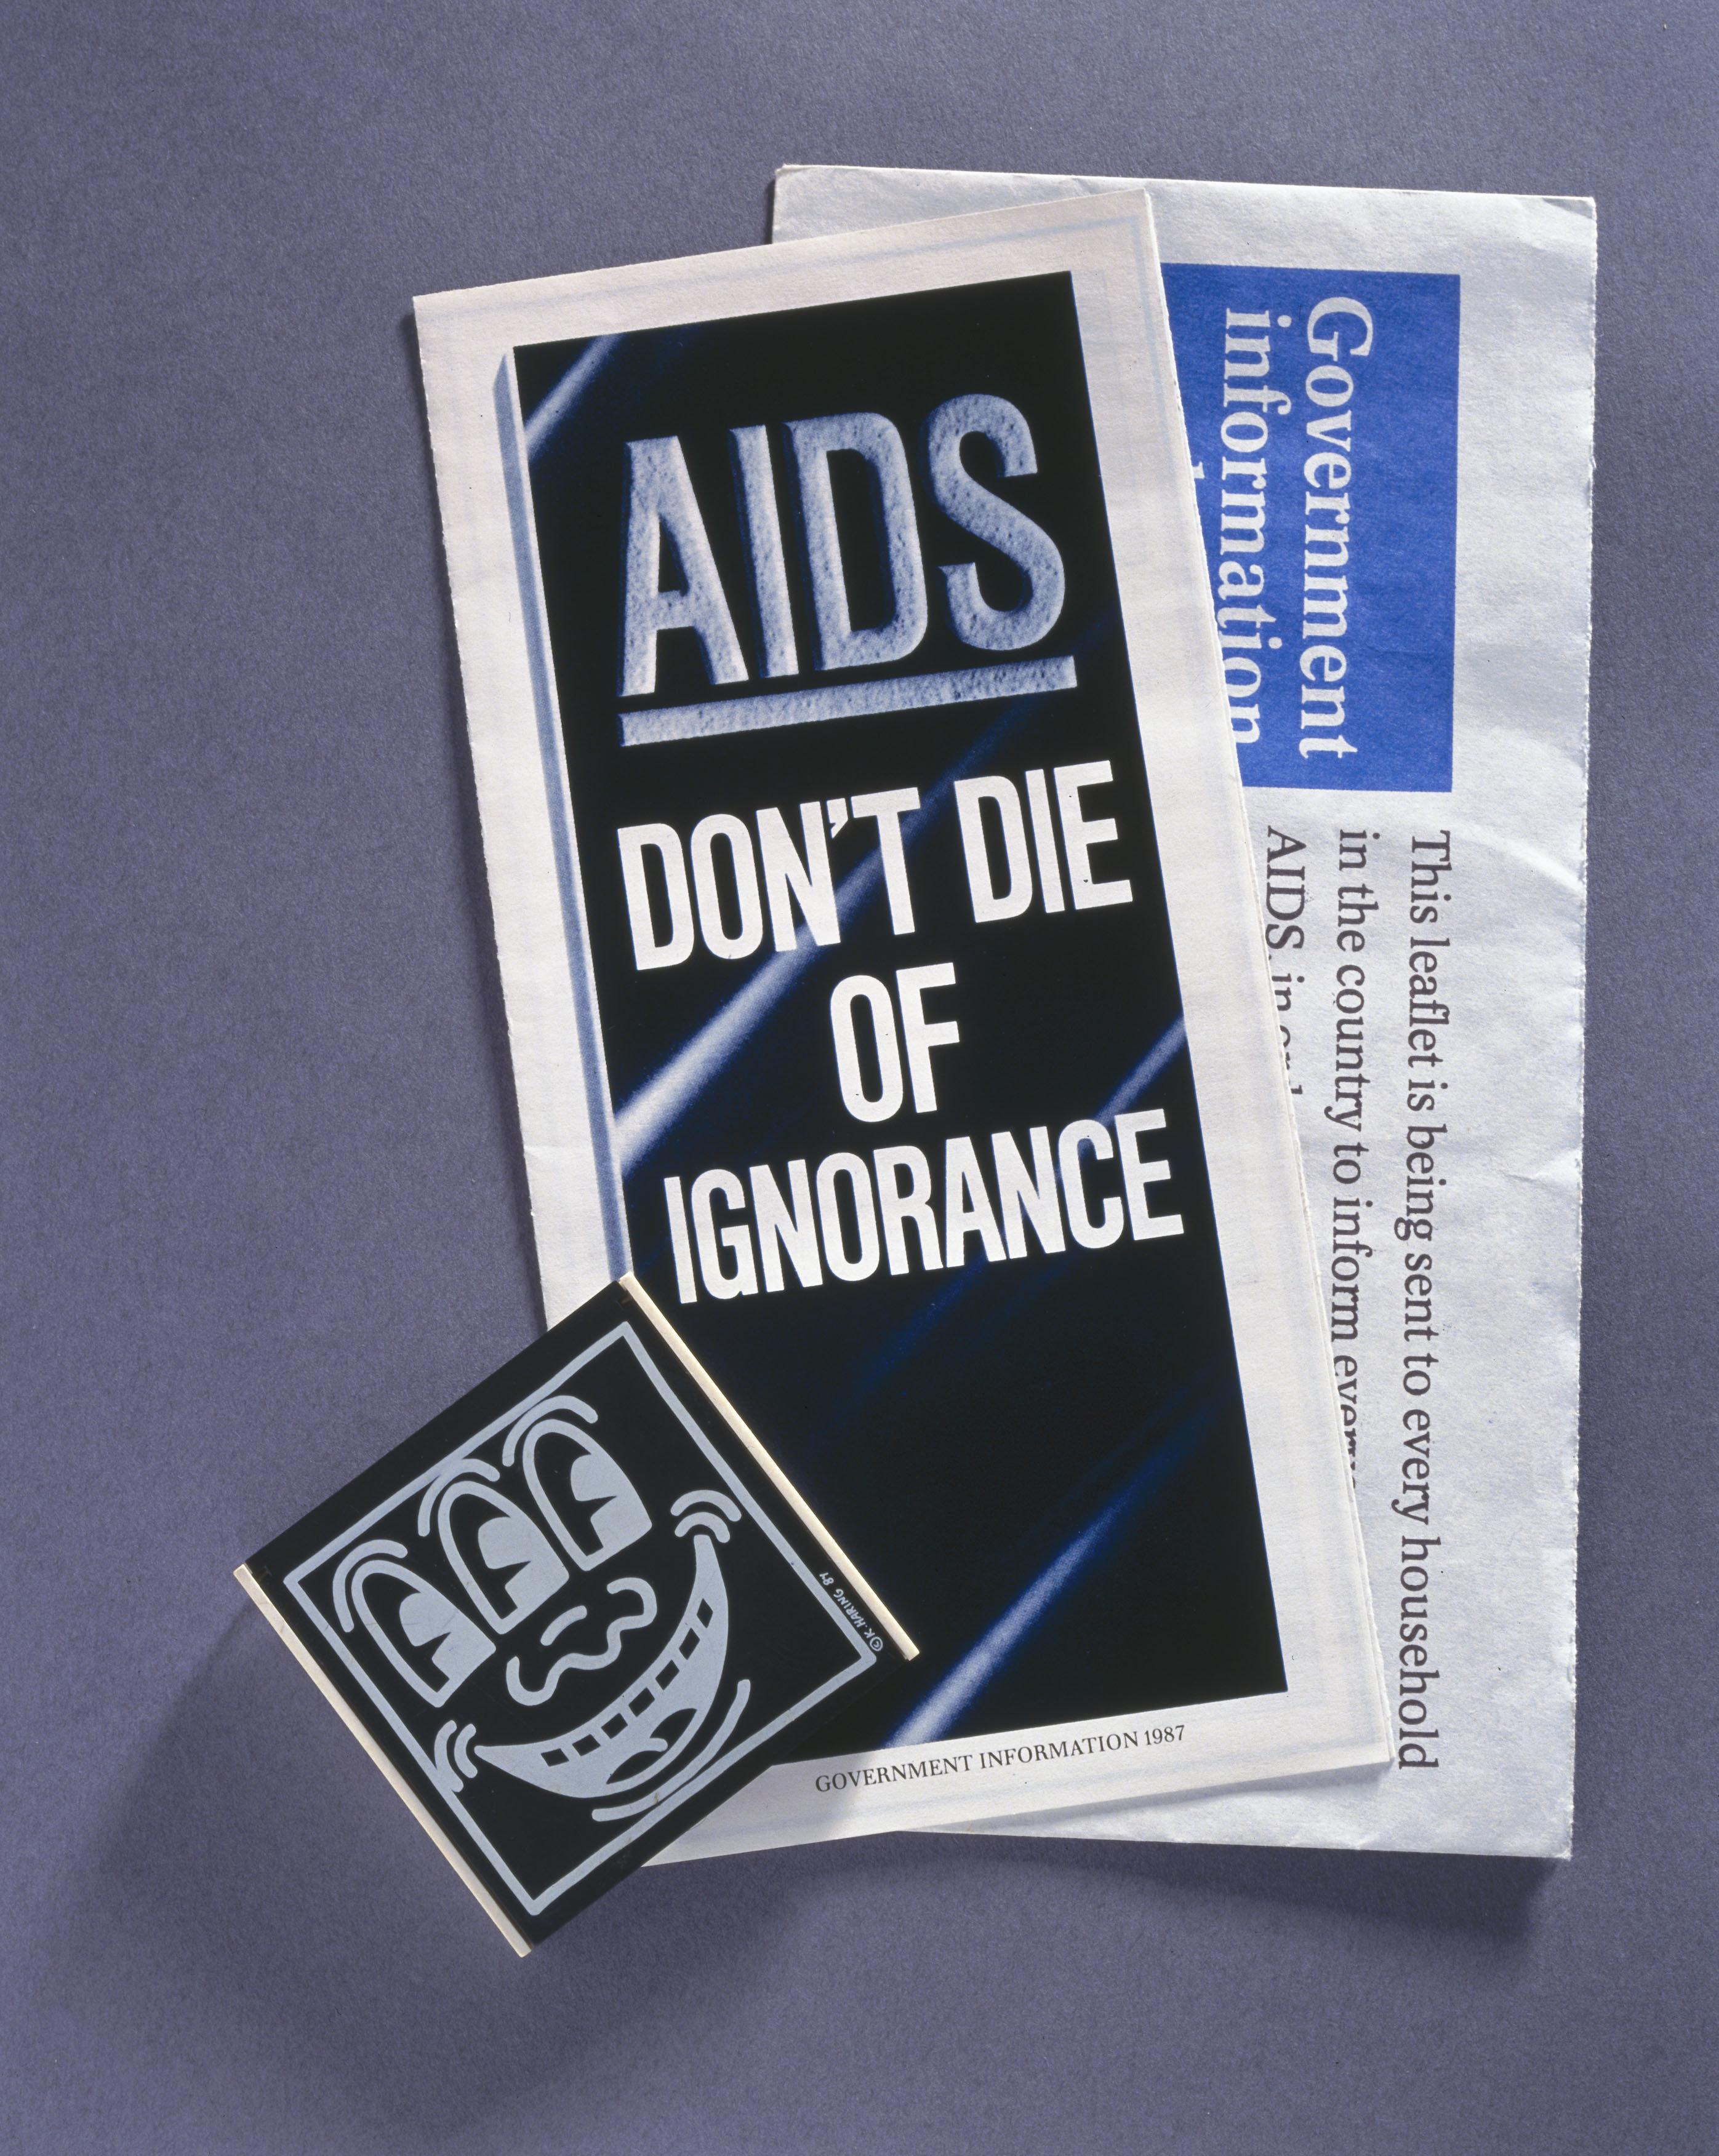 Lesbians getting aids